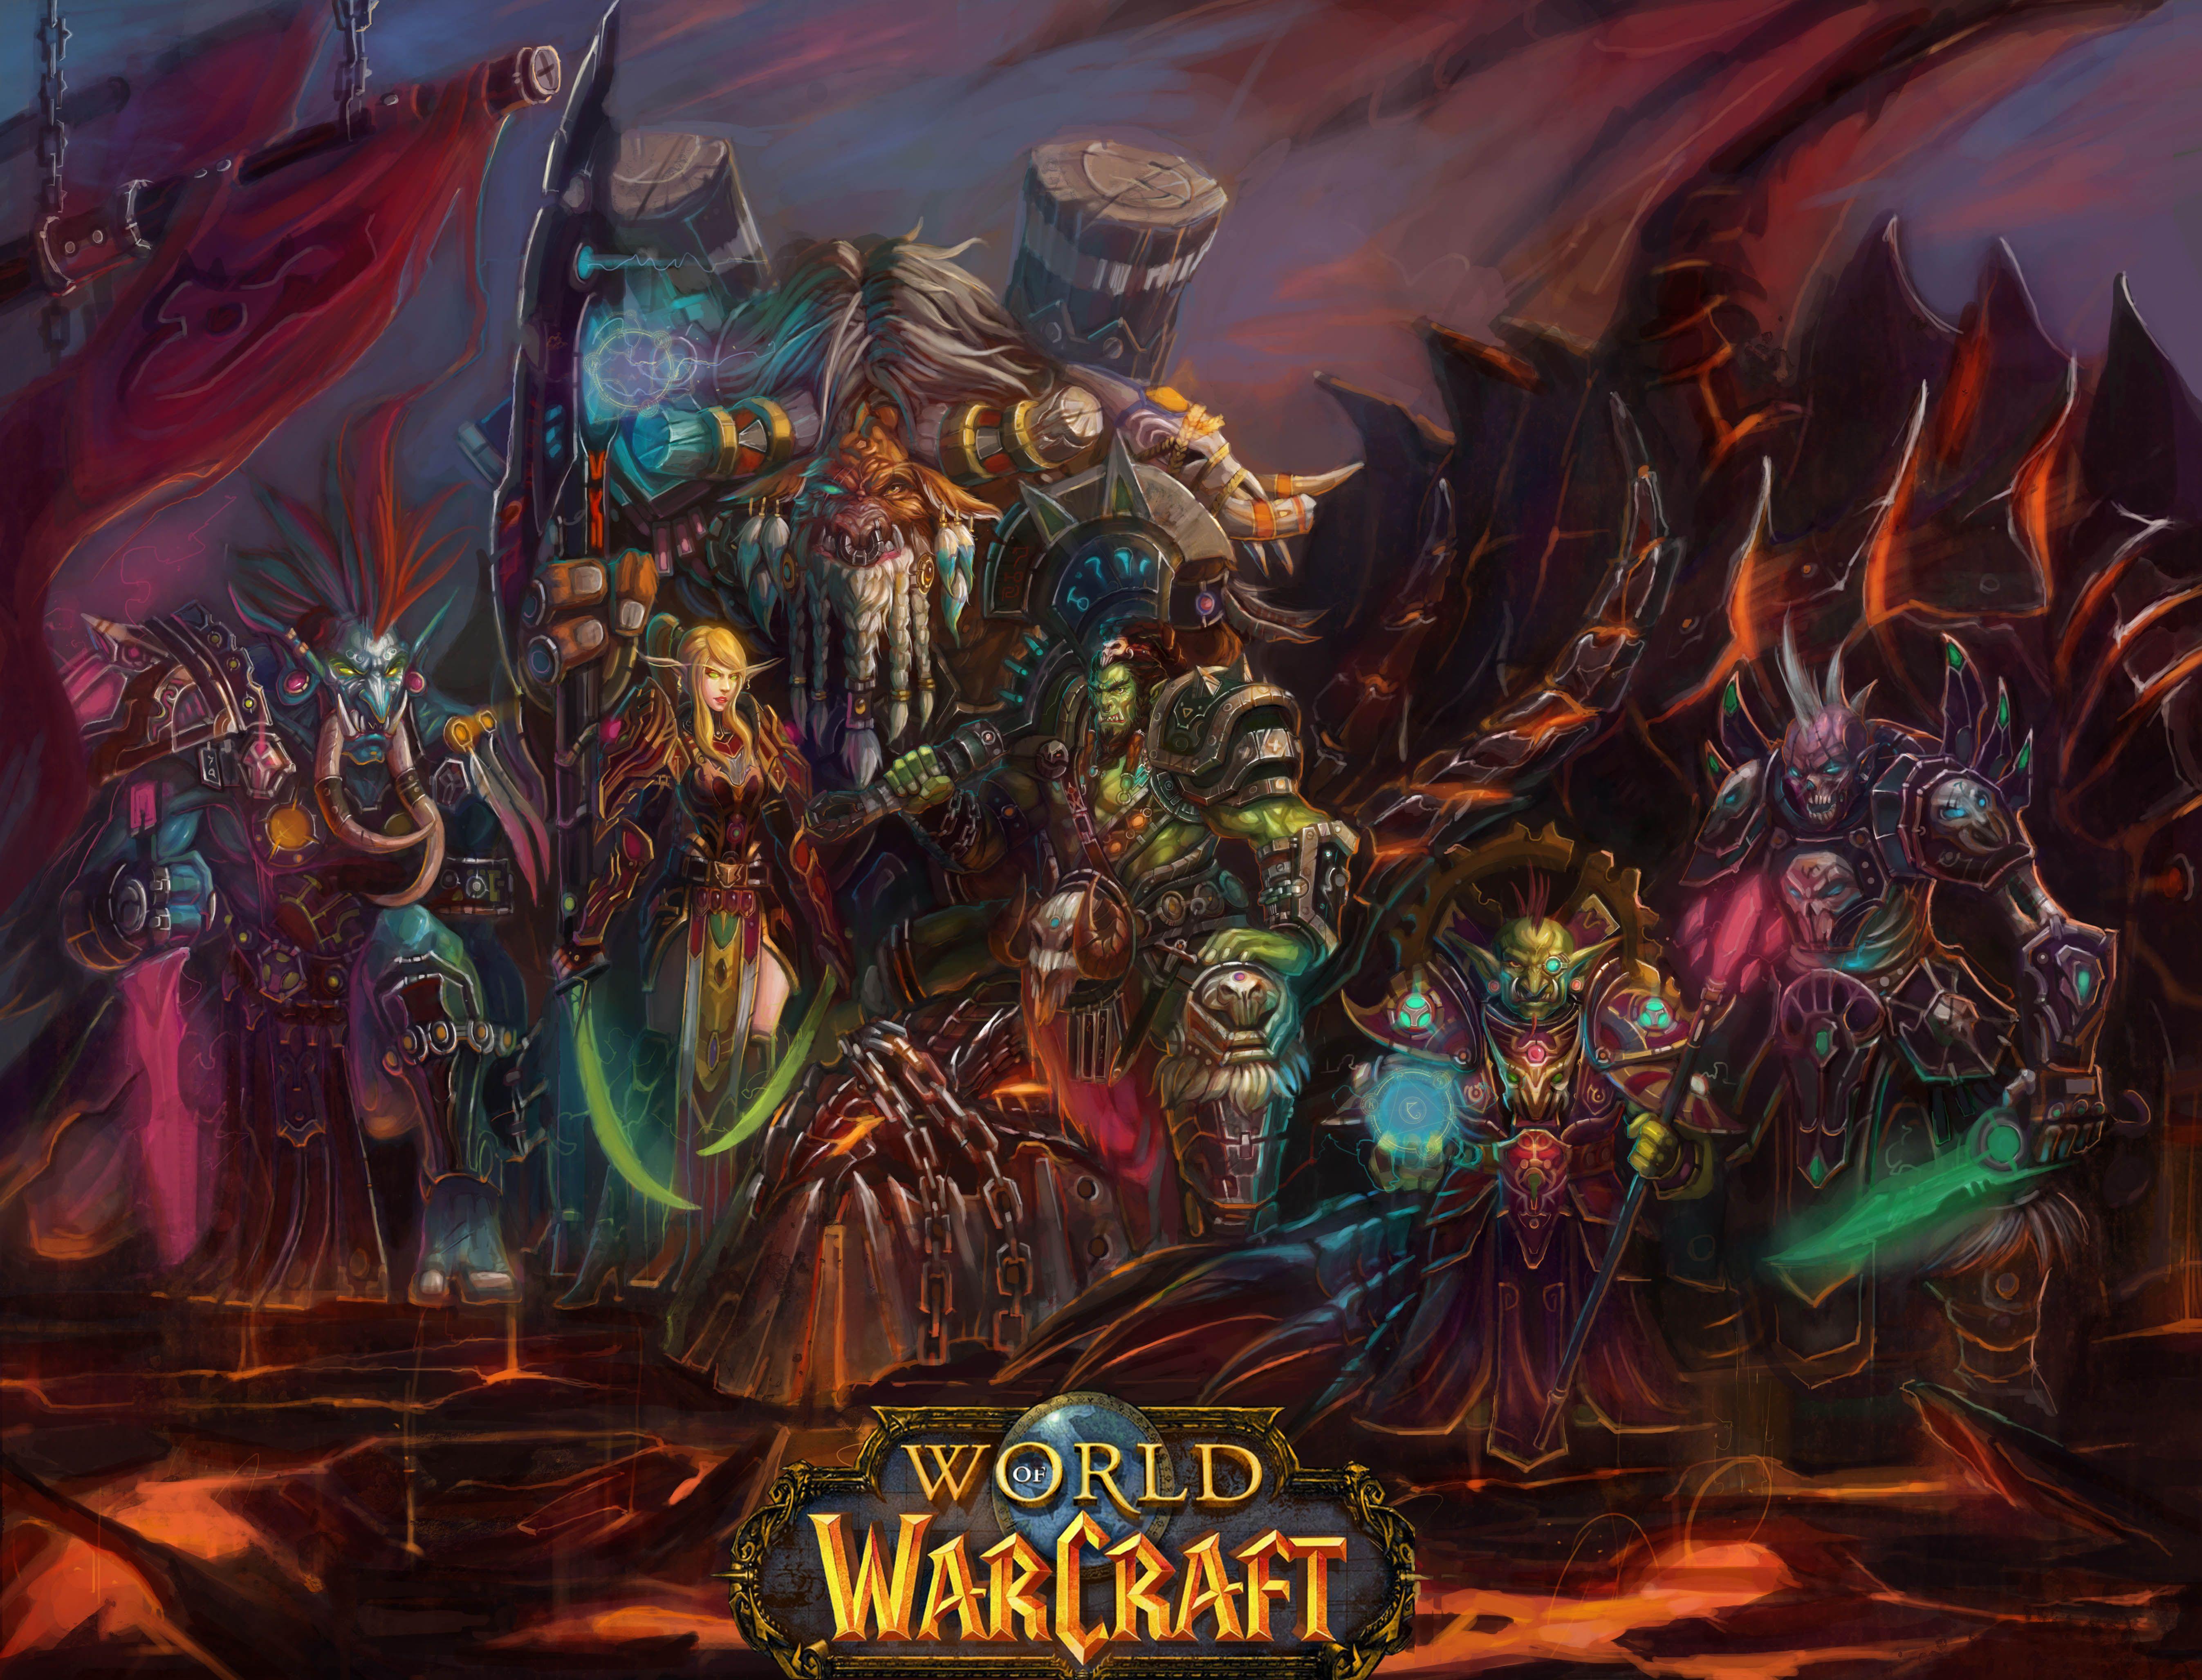 Browsing Wallpaper On Deviantart World Of Warcraft World Of